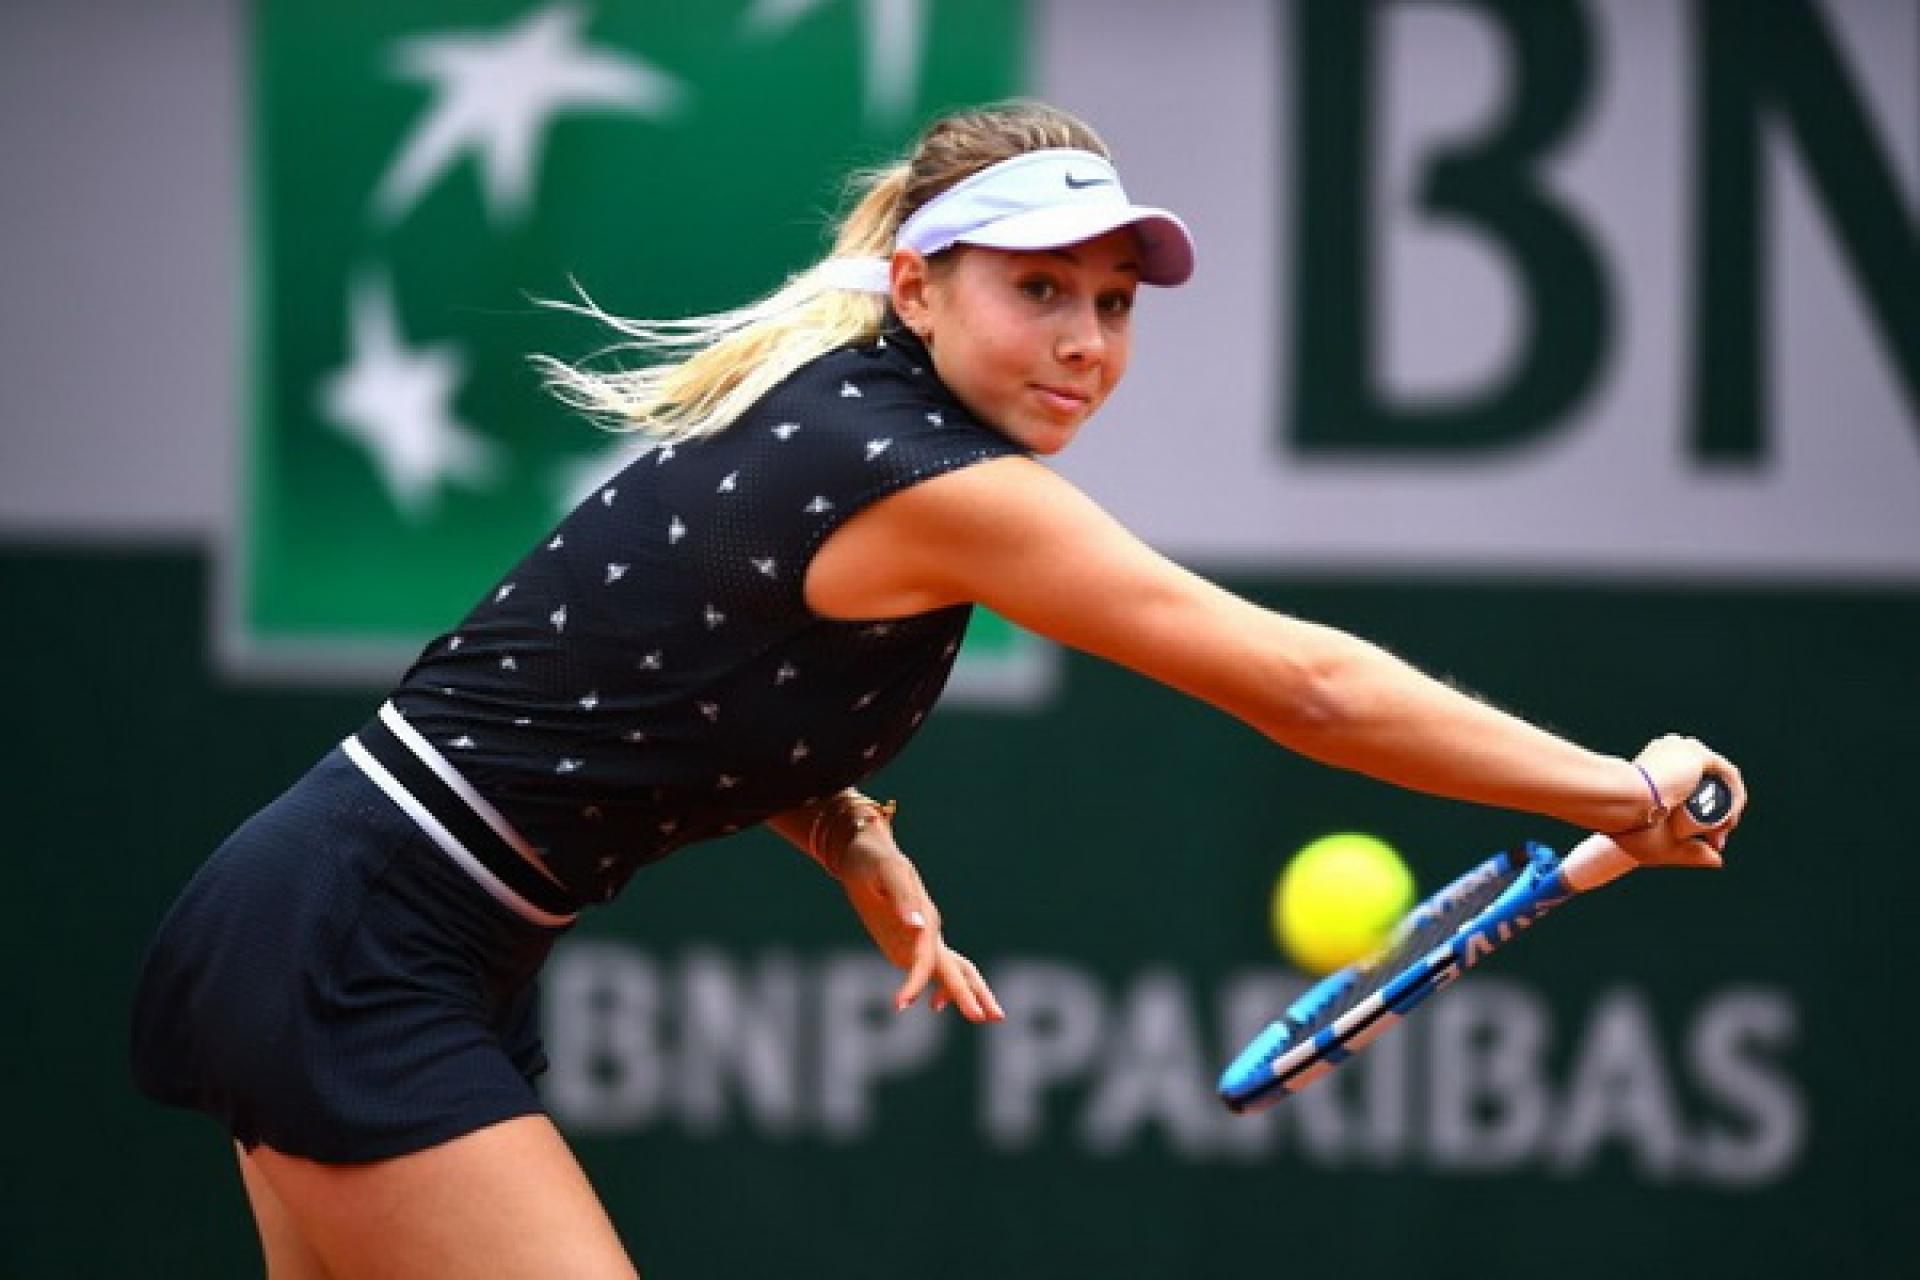 Tennis player Amanda Anisimova is a fashion inspiration for new-age girls!